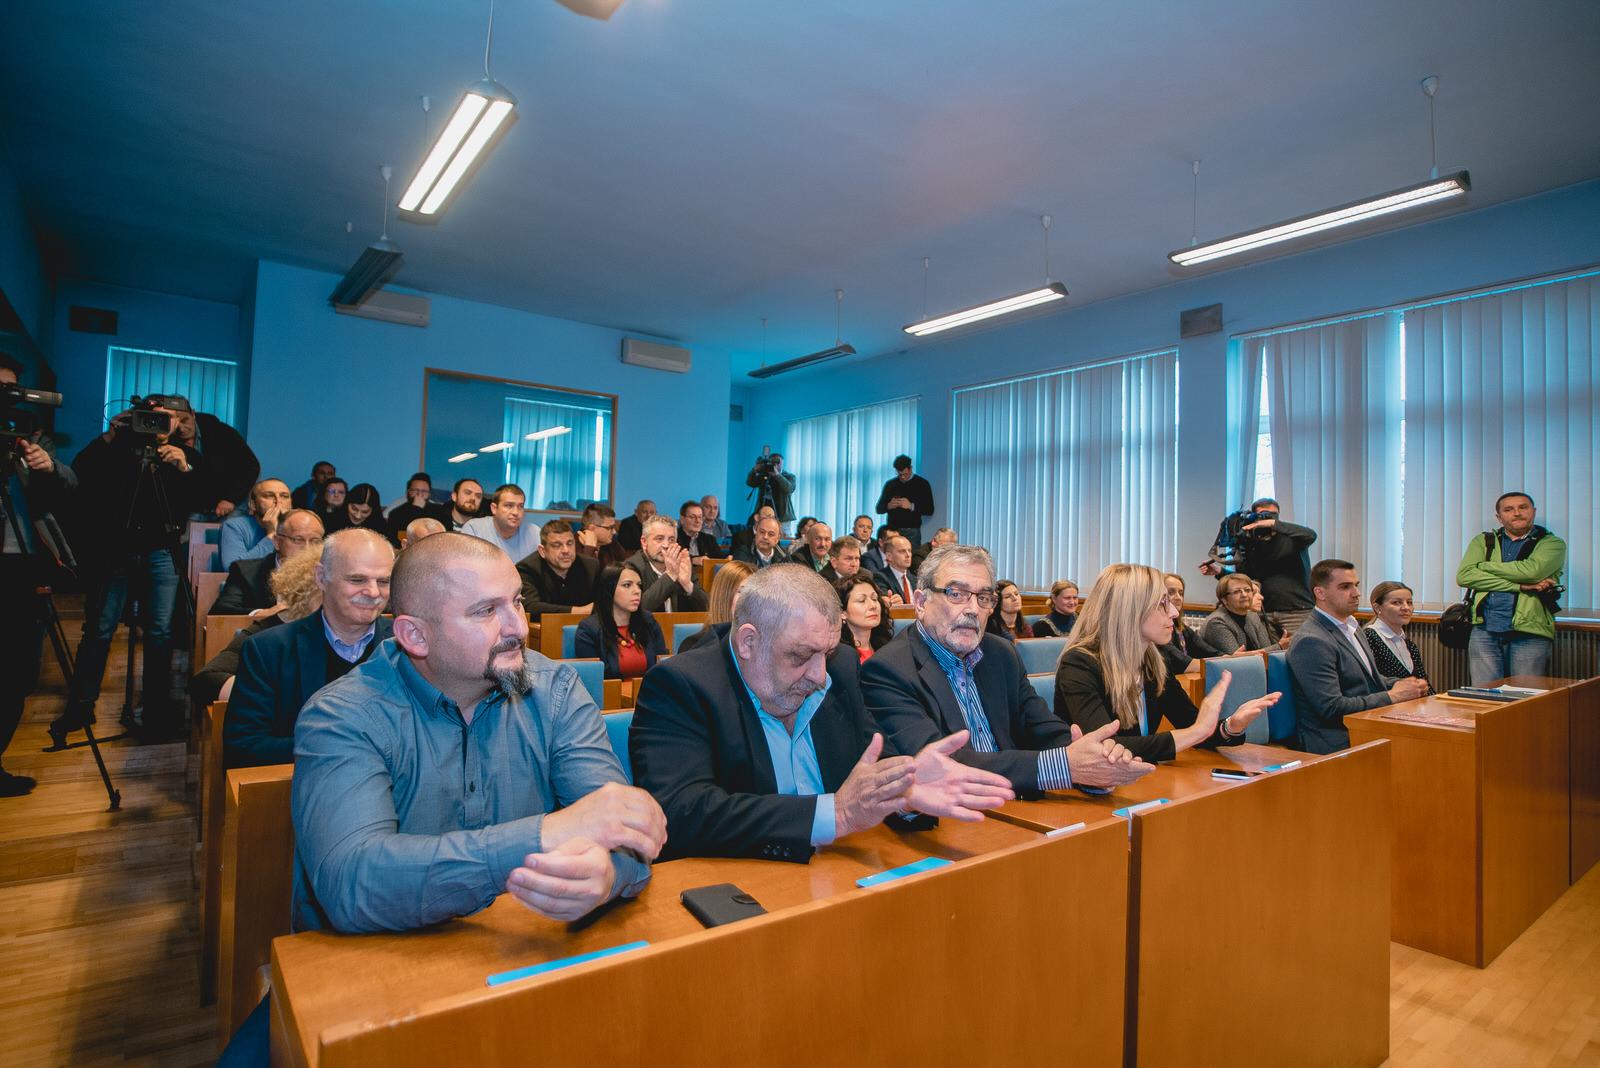 likaclub_gospić_skupština_travanj-2019-29